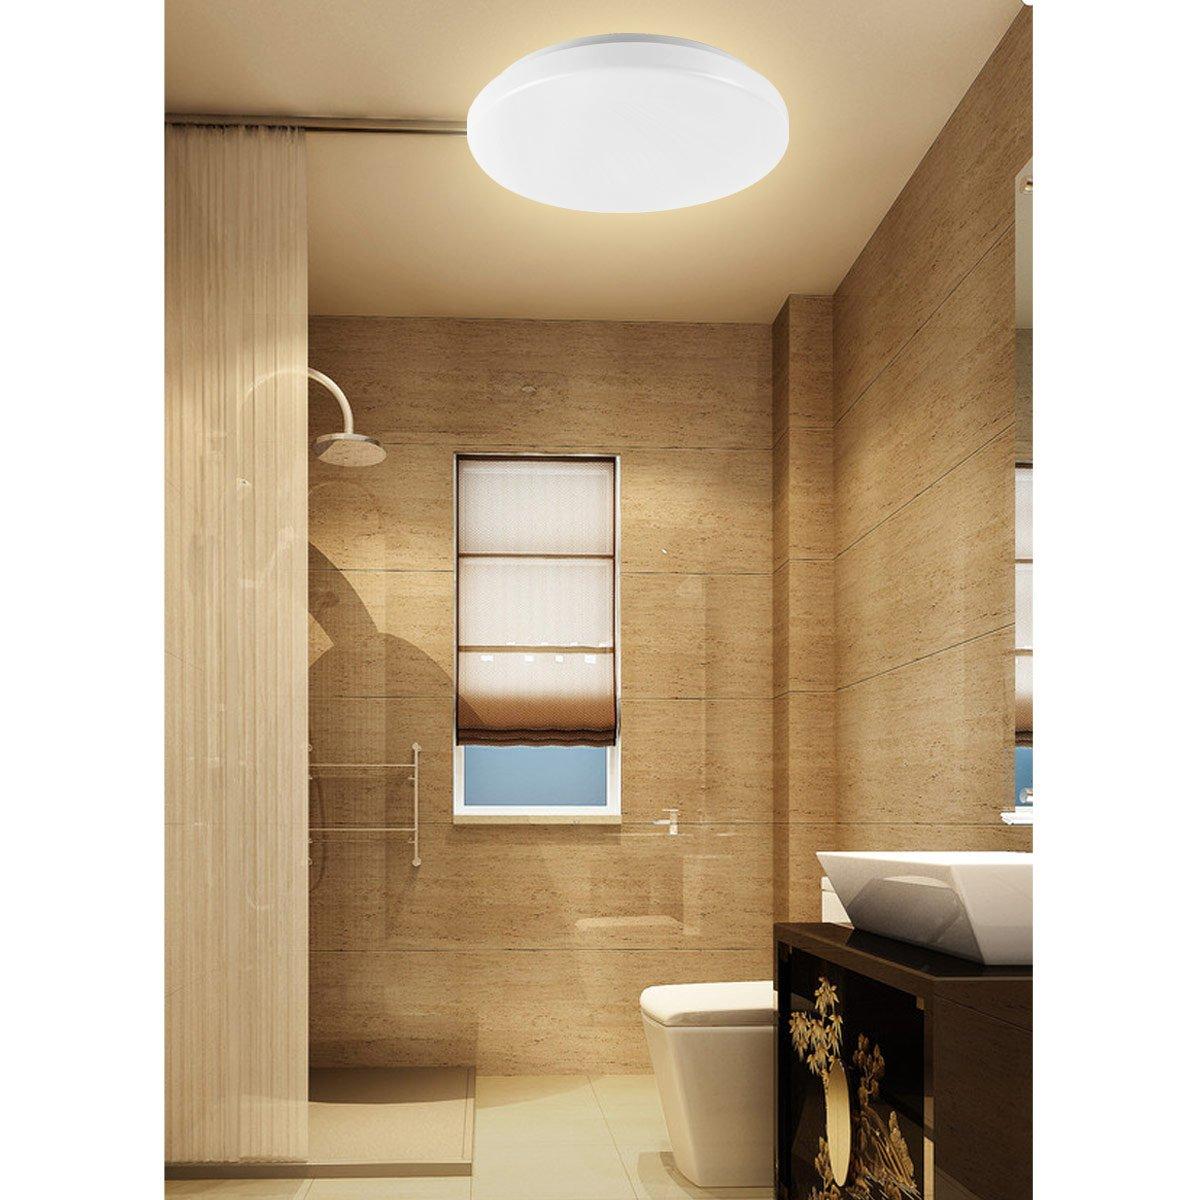 deckenlampe fr flur gallery of metall retro wandlampen lampe ee typ fr flur wandlampen with. Black Bedroom Furniture Sets. Home Design Ideas